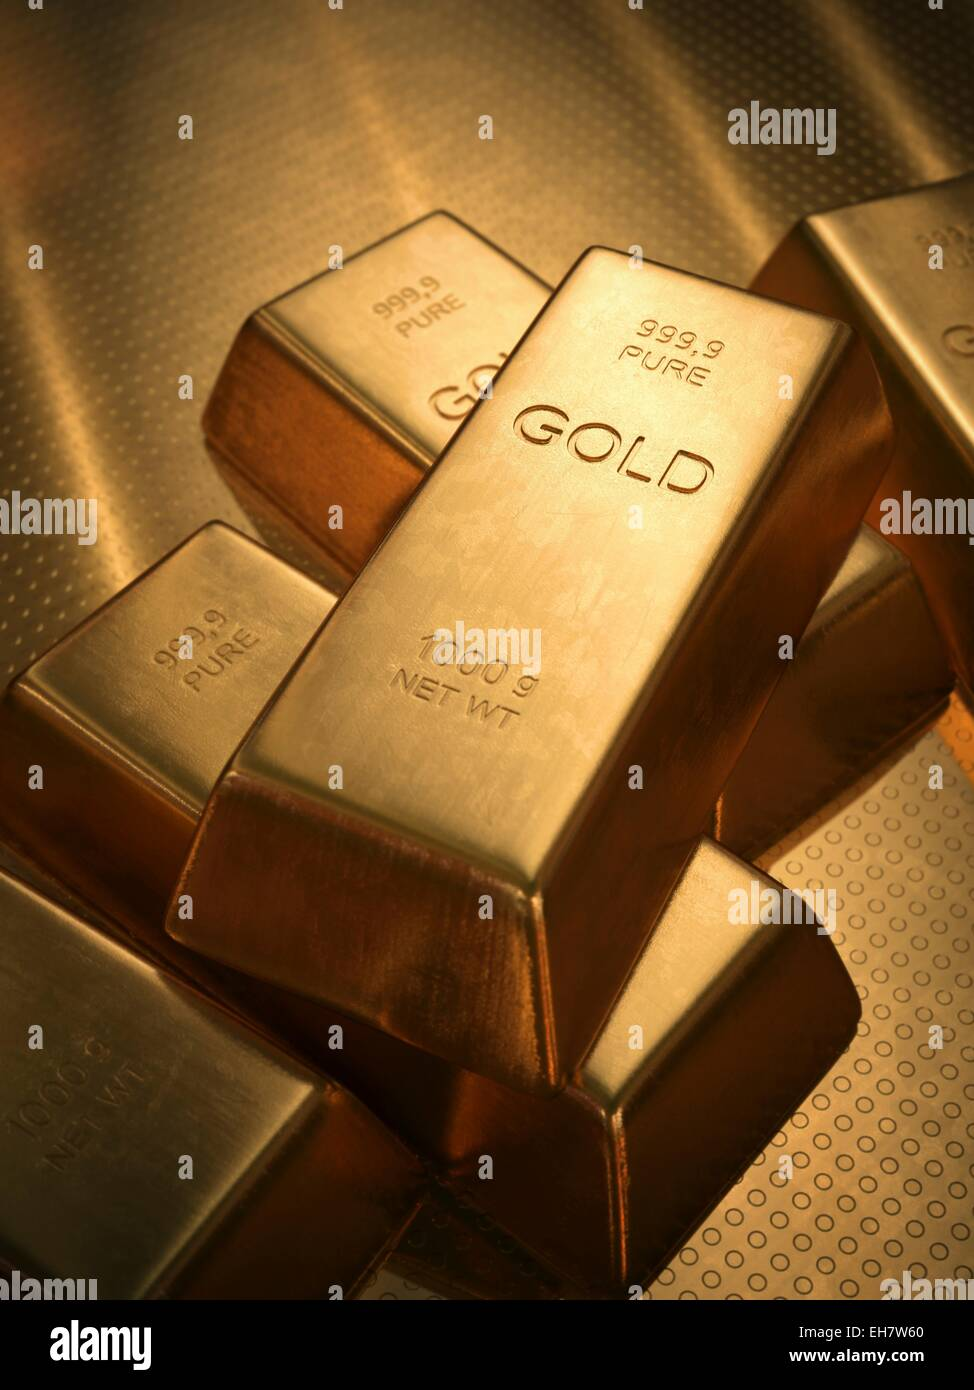 Gold bullion, illustration - Stock Image